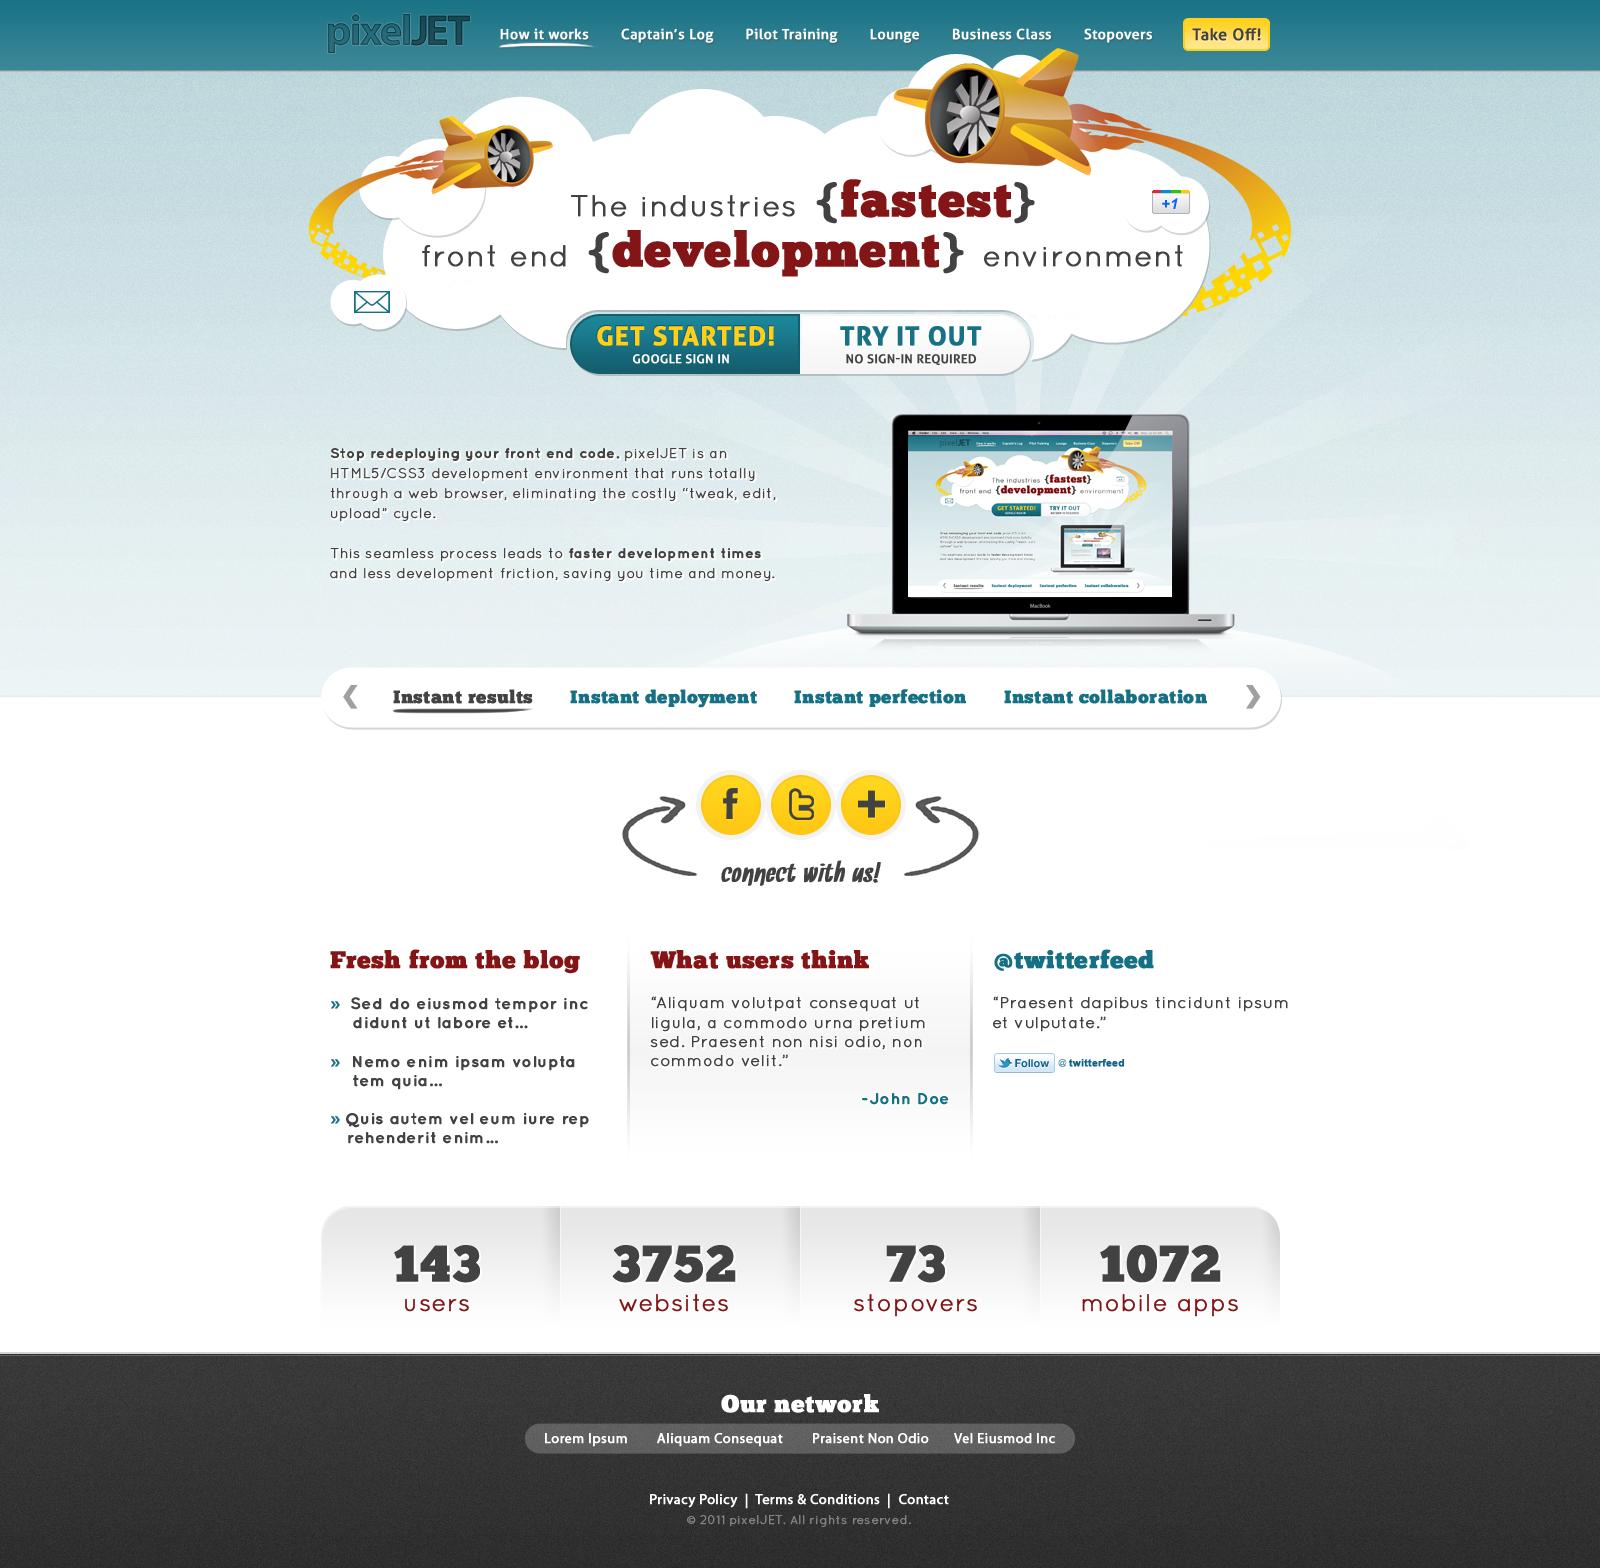 website design for pixelJET